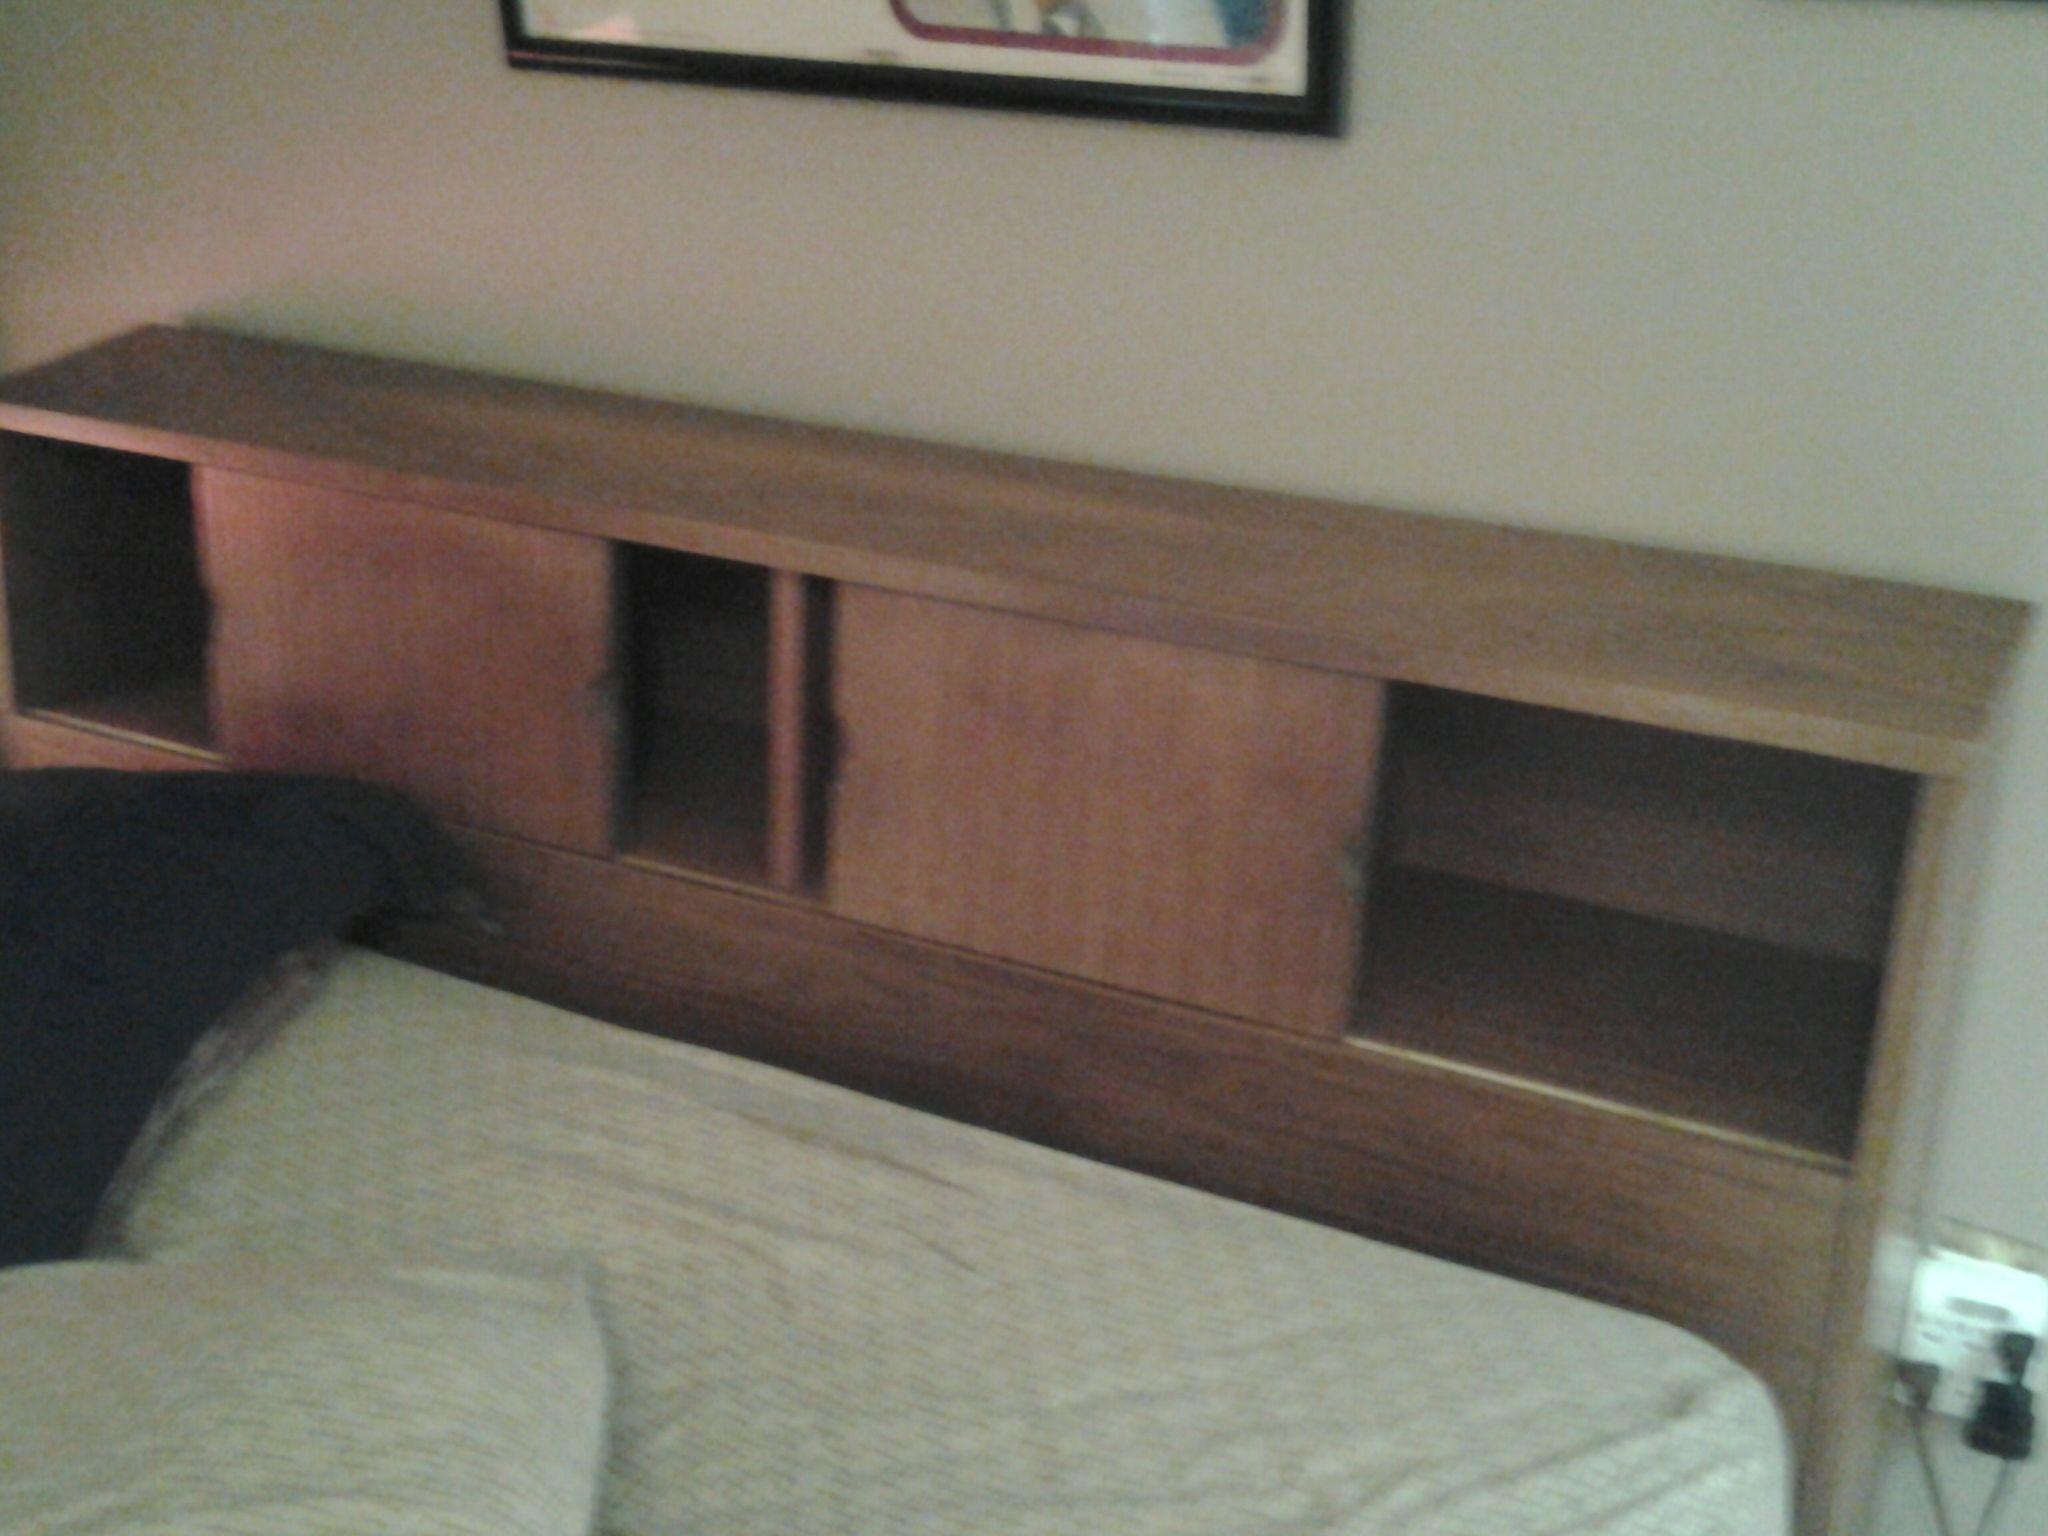 60 S Style Bookcase Headboard Bookcase Headboard Home Headboard